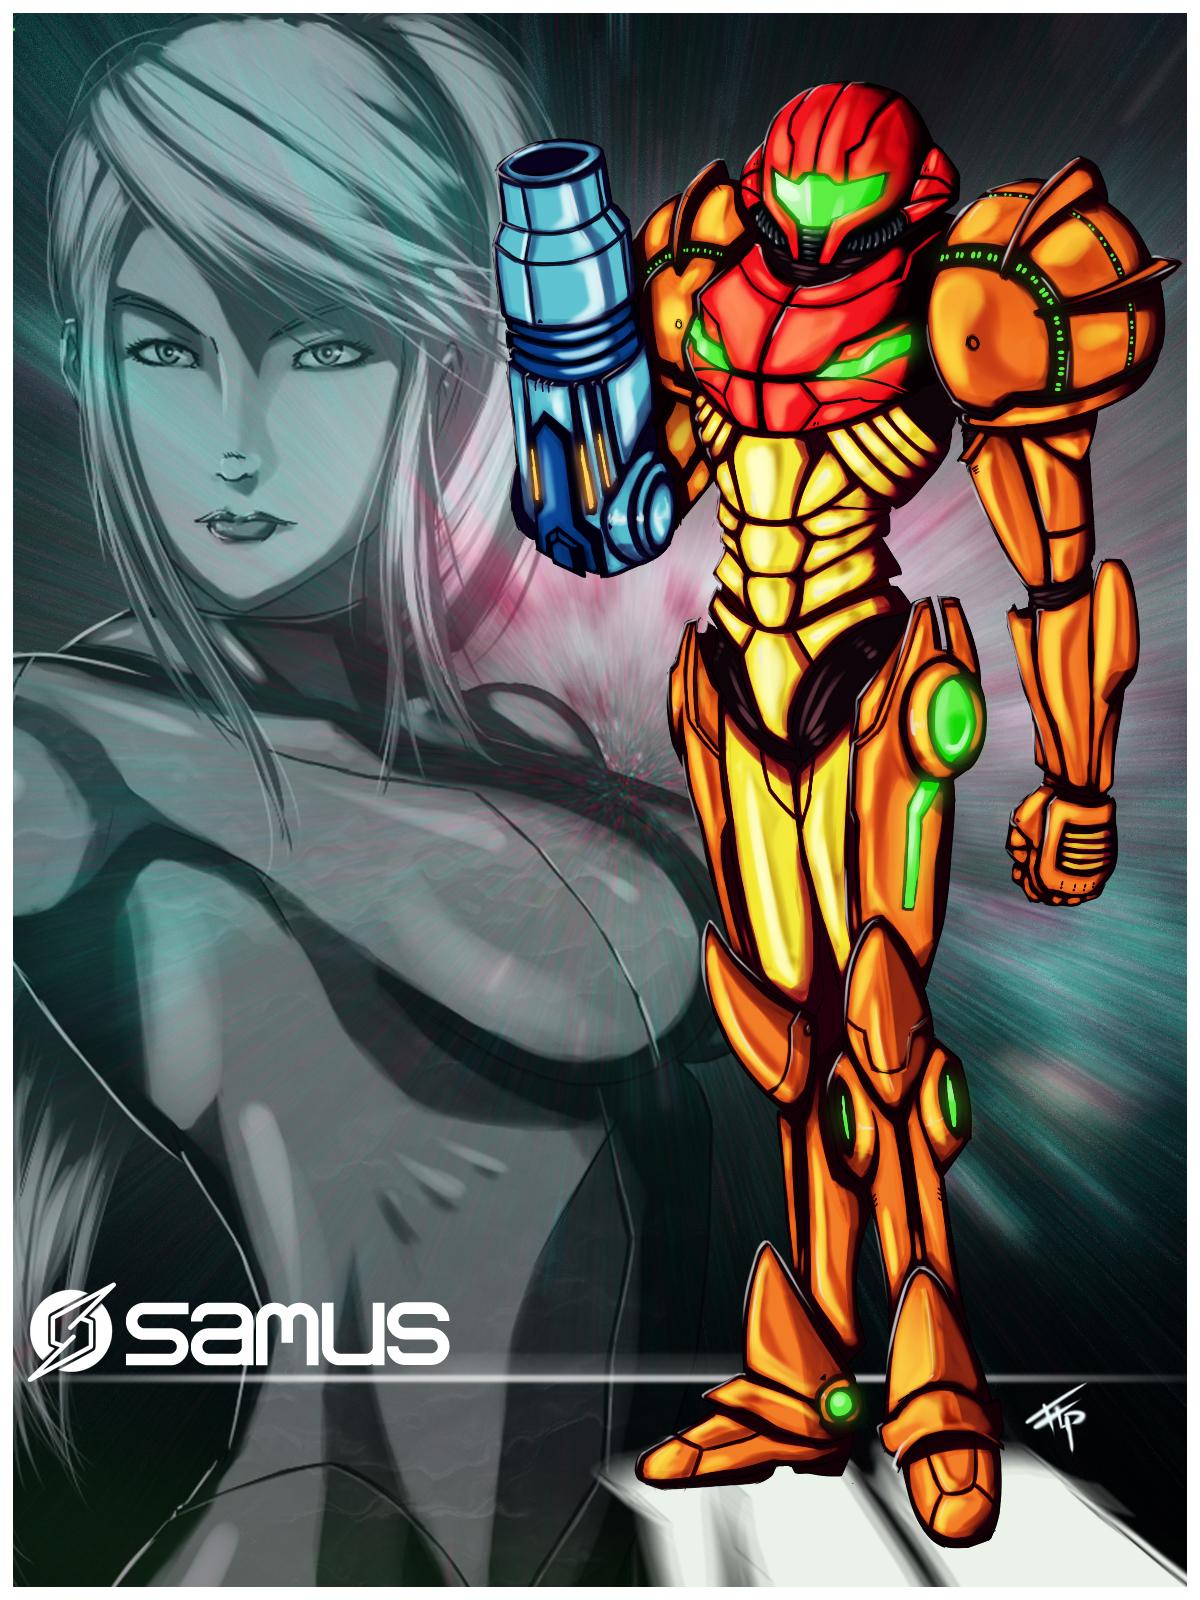 Metroid Samus Aran Varia Suit By Bathiel On Deviantart